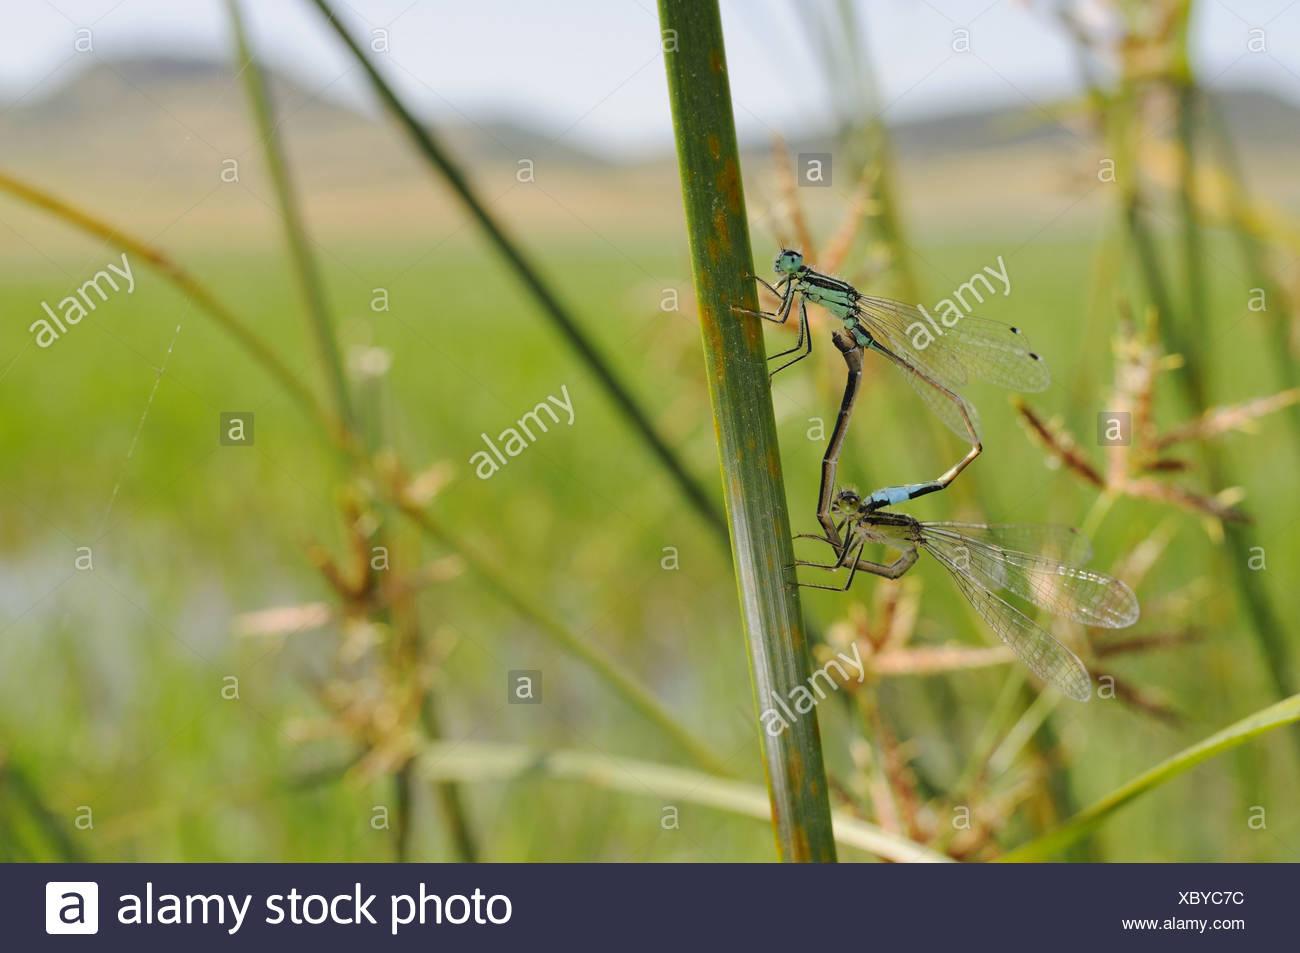 damselfly freshwater insect Invertebrates Ischnura genei Italy mating Odonata rare species Sardinia invertebrate invertebrates Stock Photo